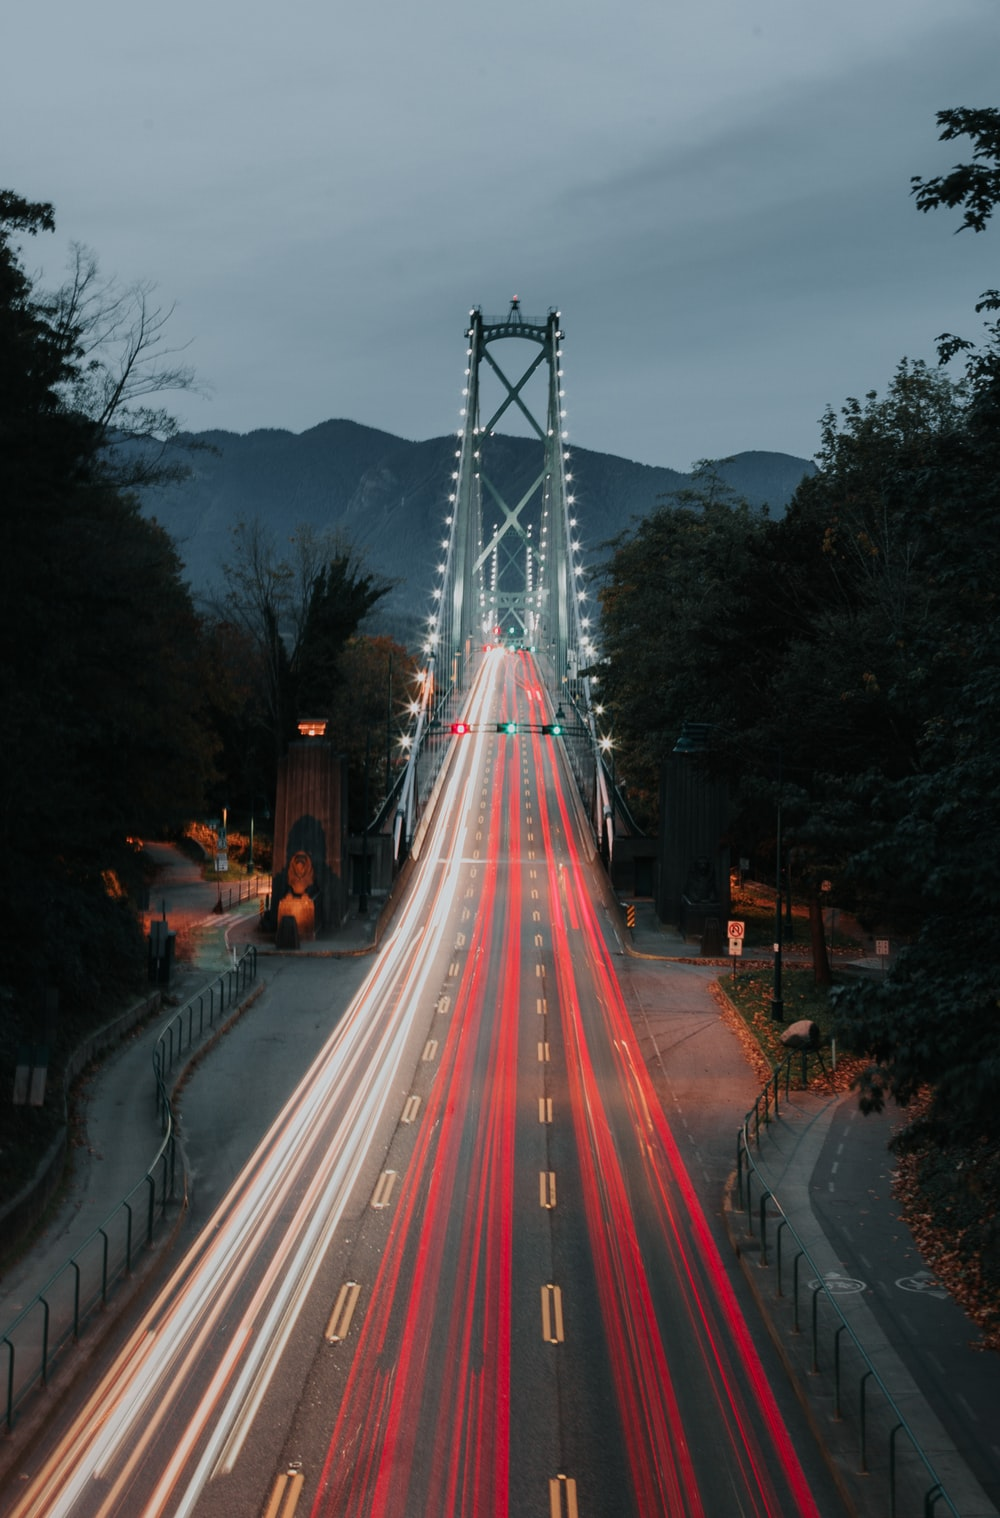 bridge at nighttime long exposure photography